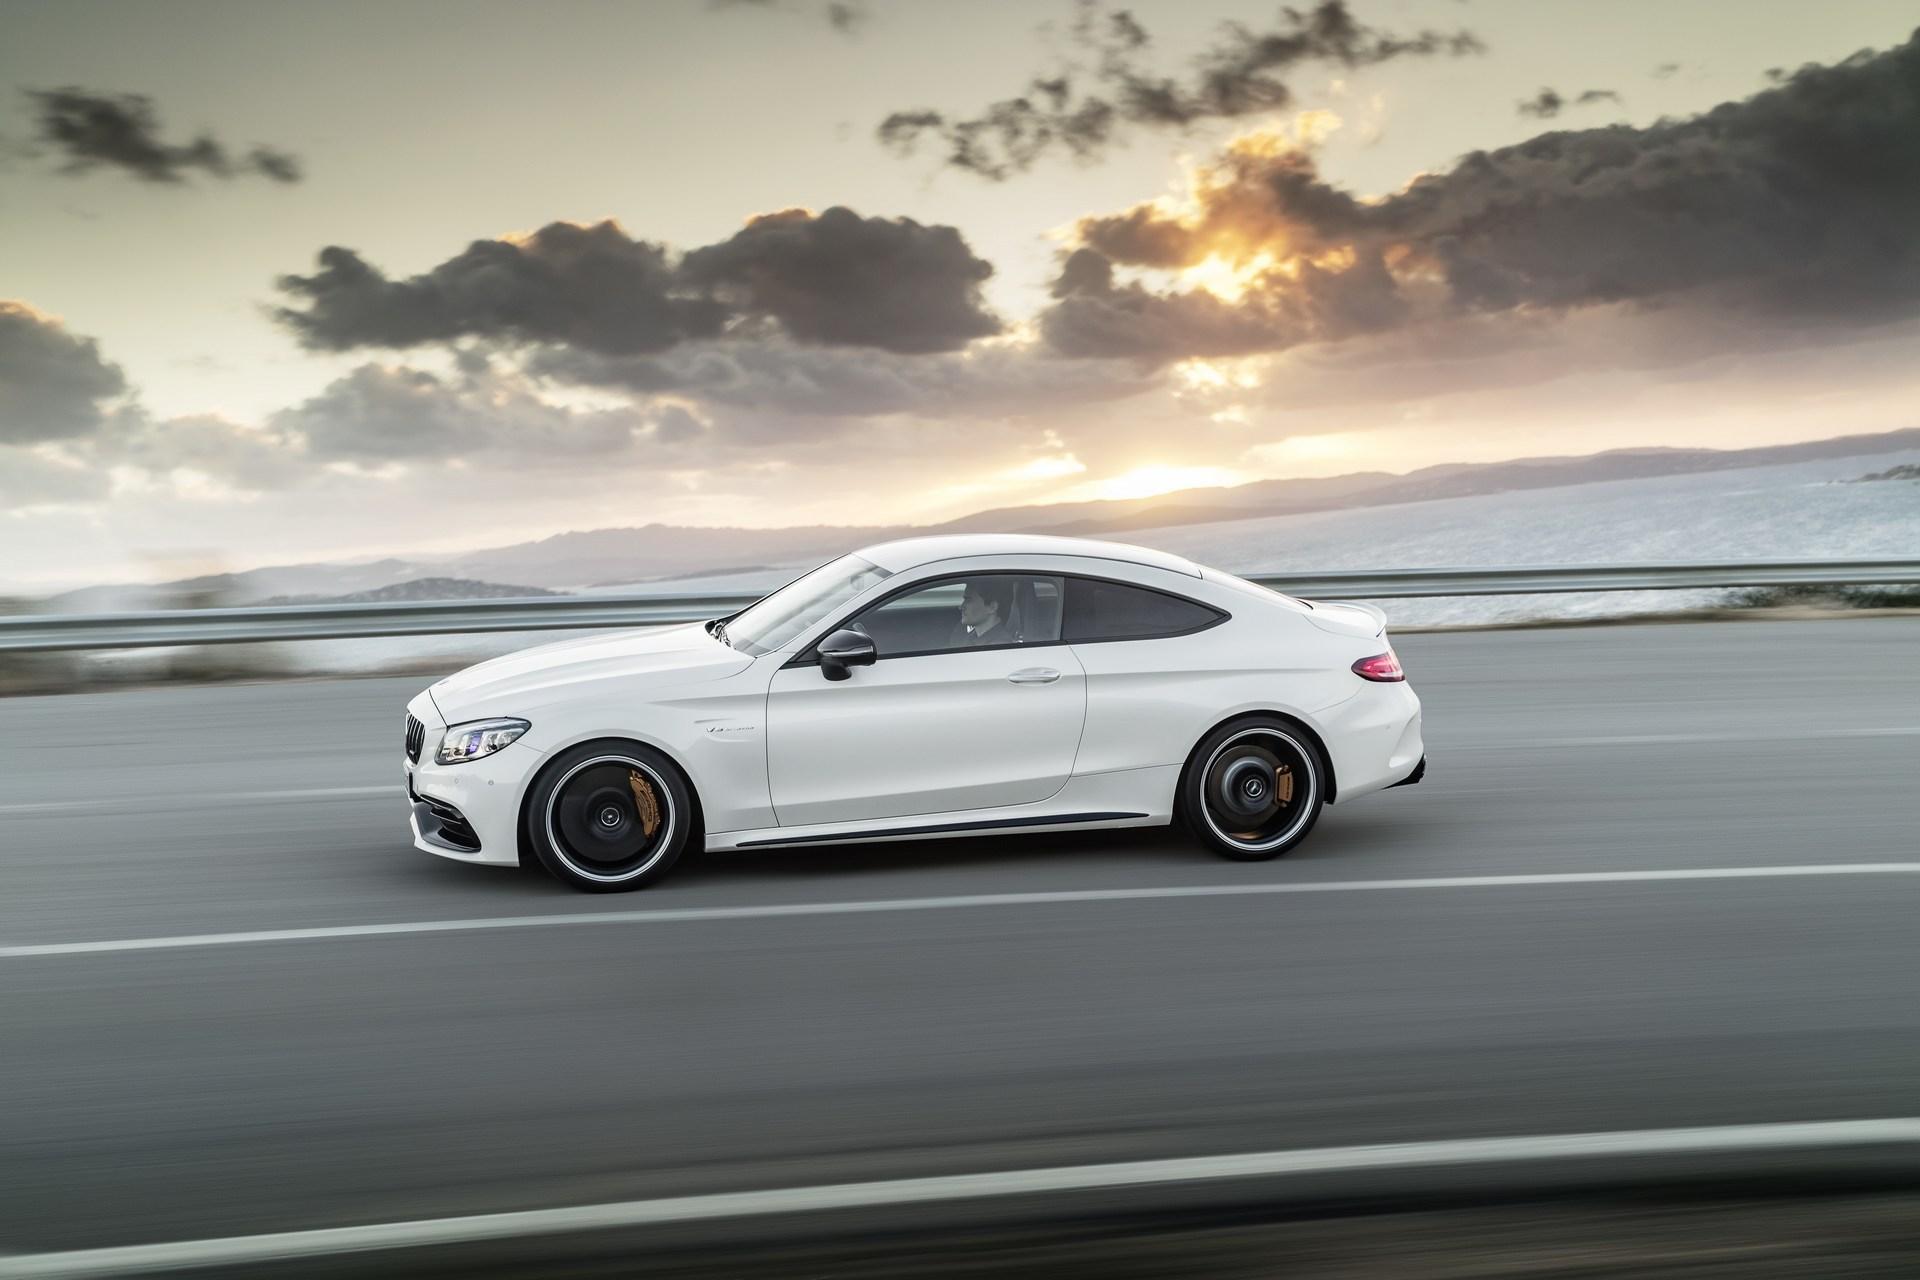 Mercedes-AMG-C63-Coupe-6.jpg